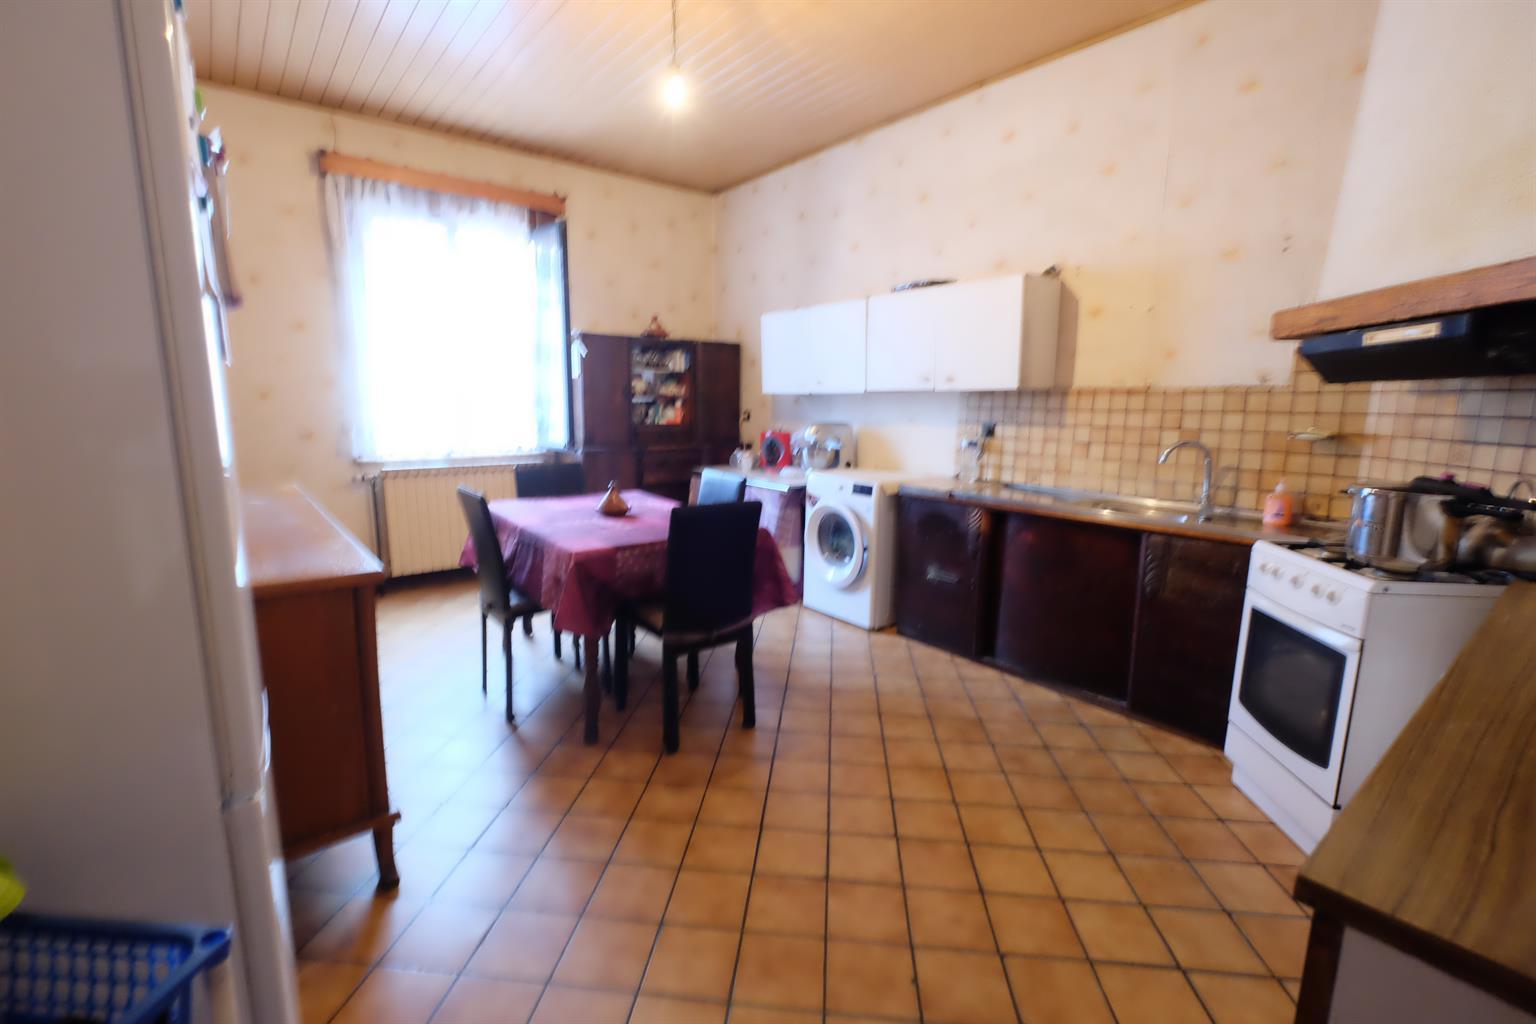 Maison - Colfontaine - #4501144-10